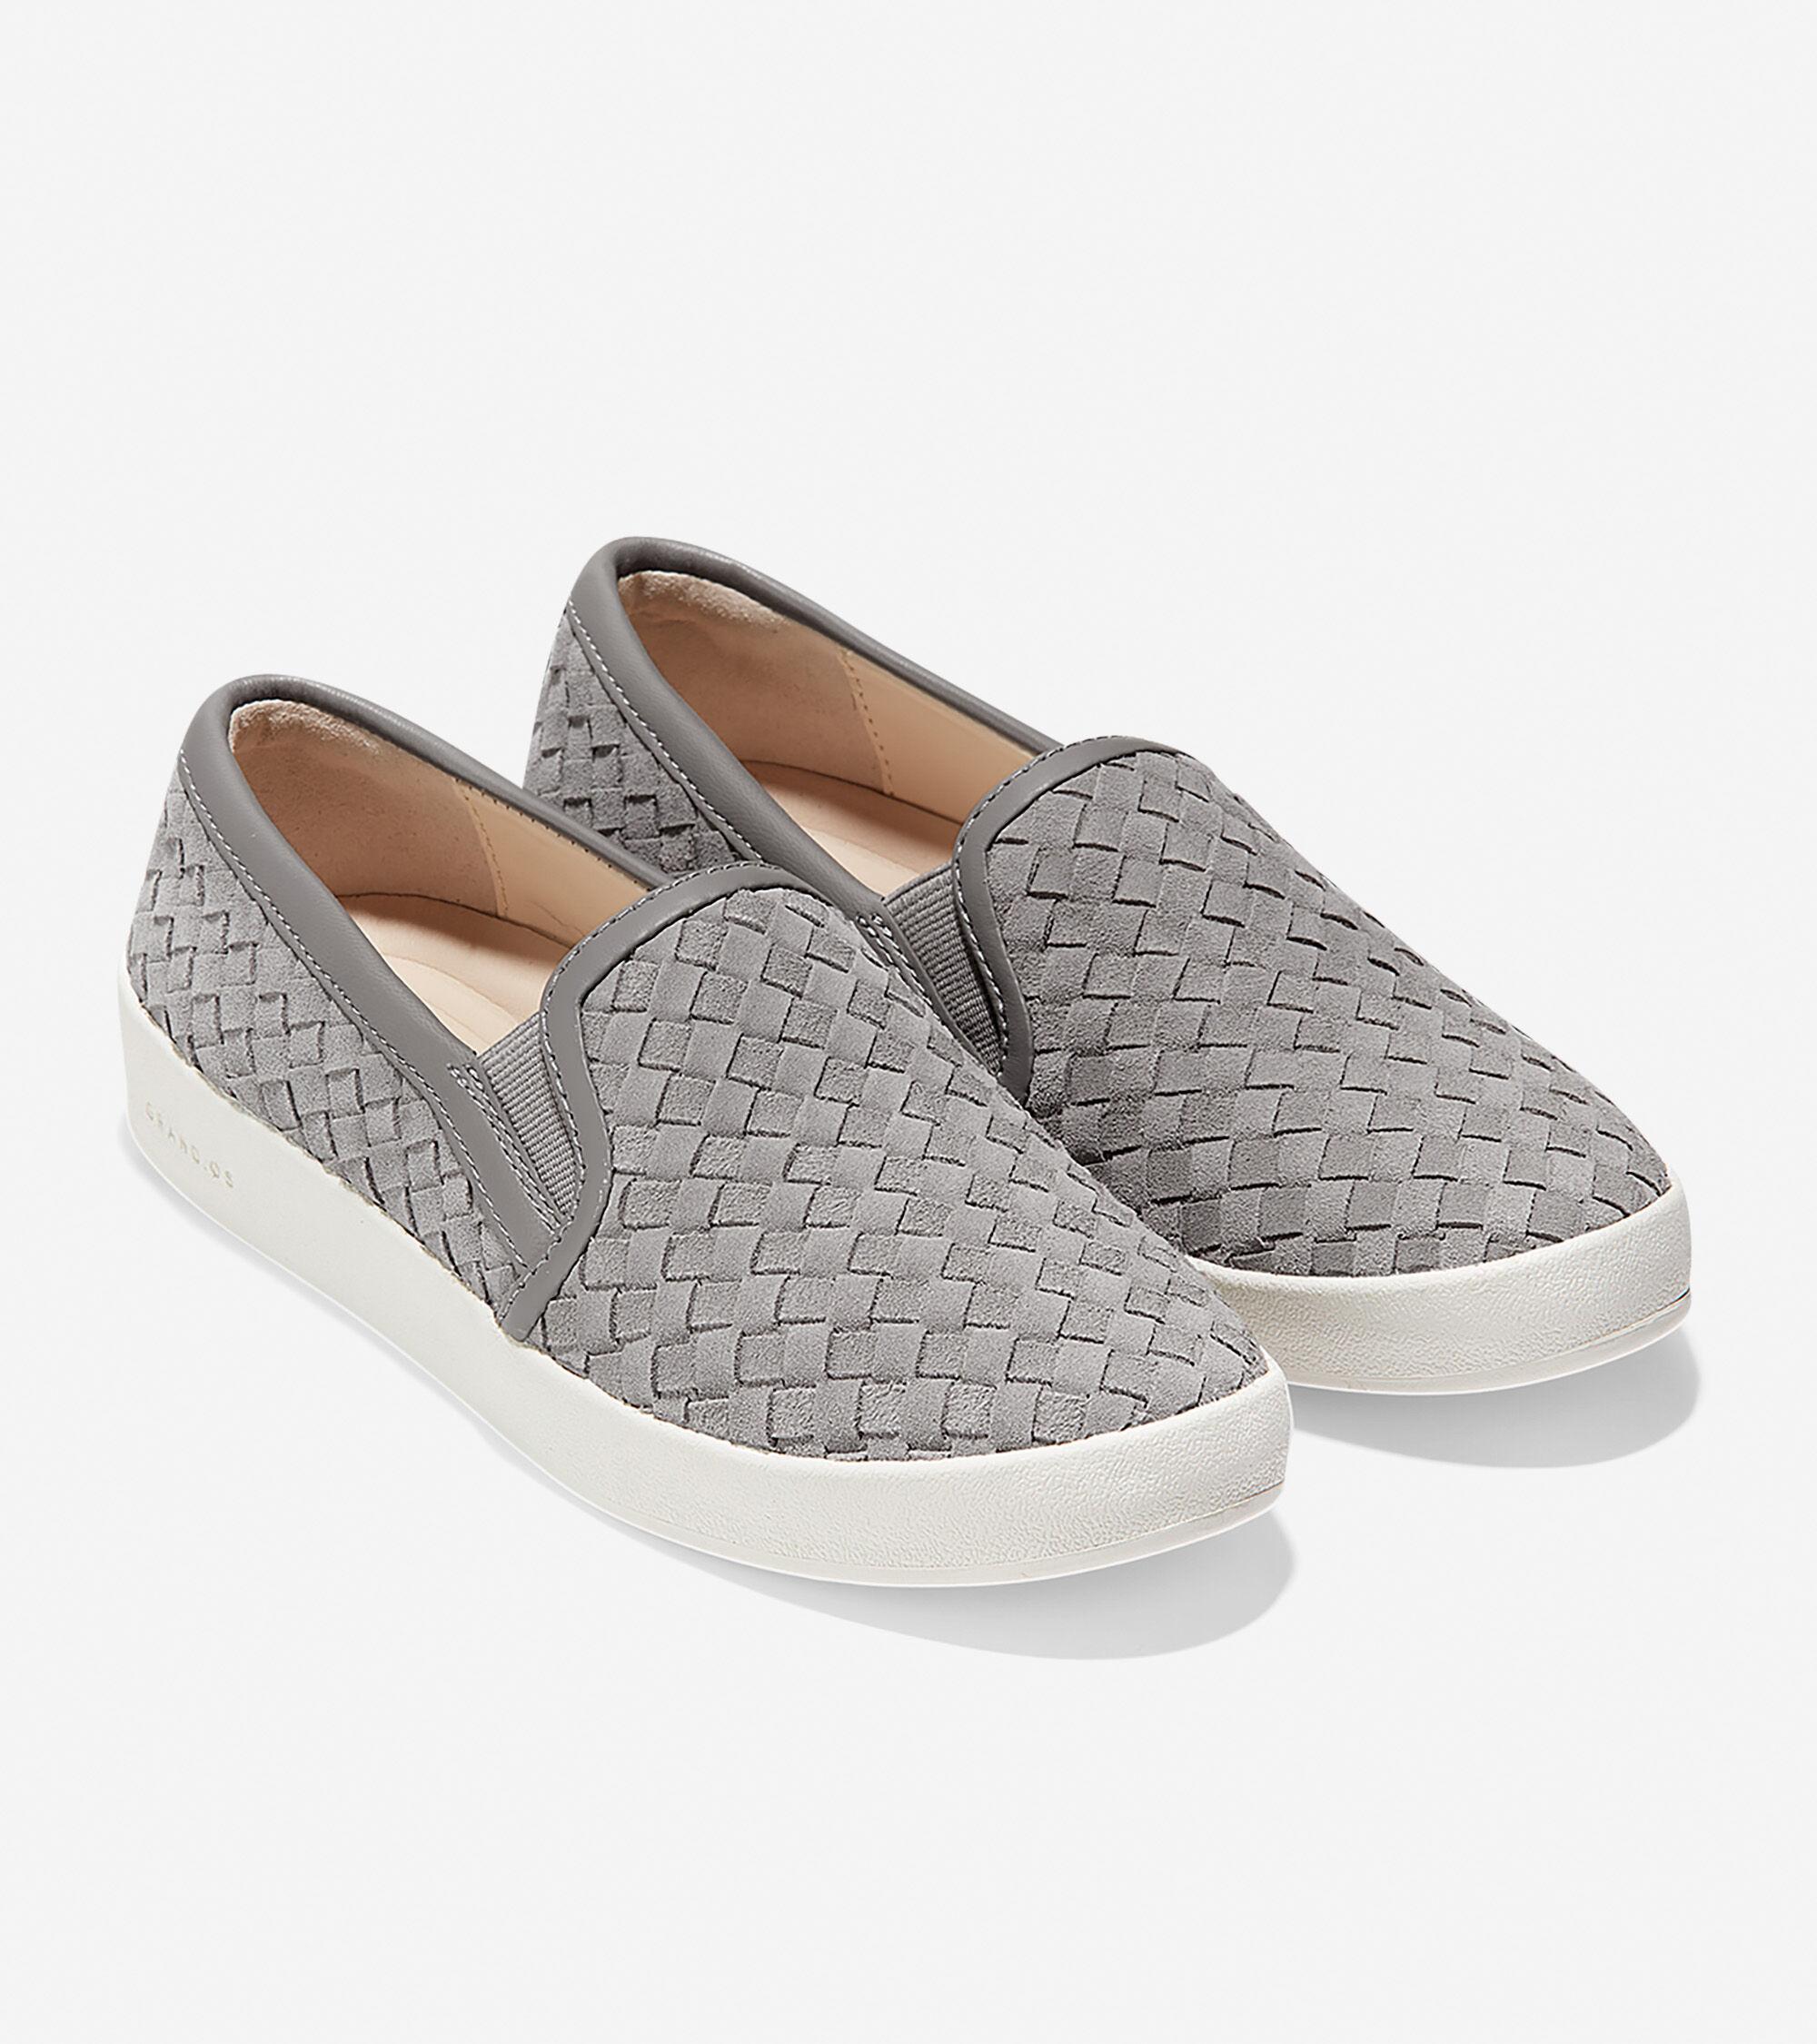 cole haan slip on sneakers